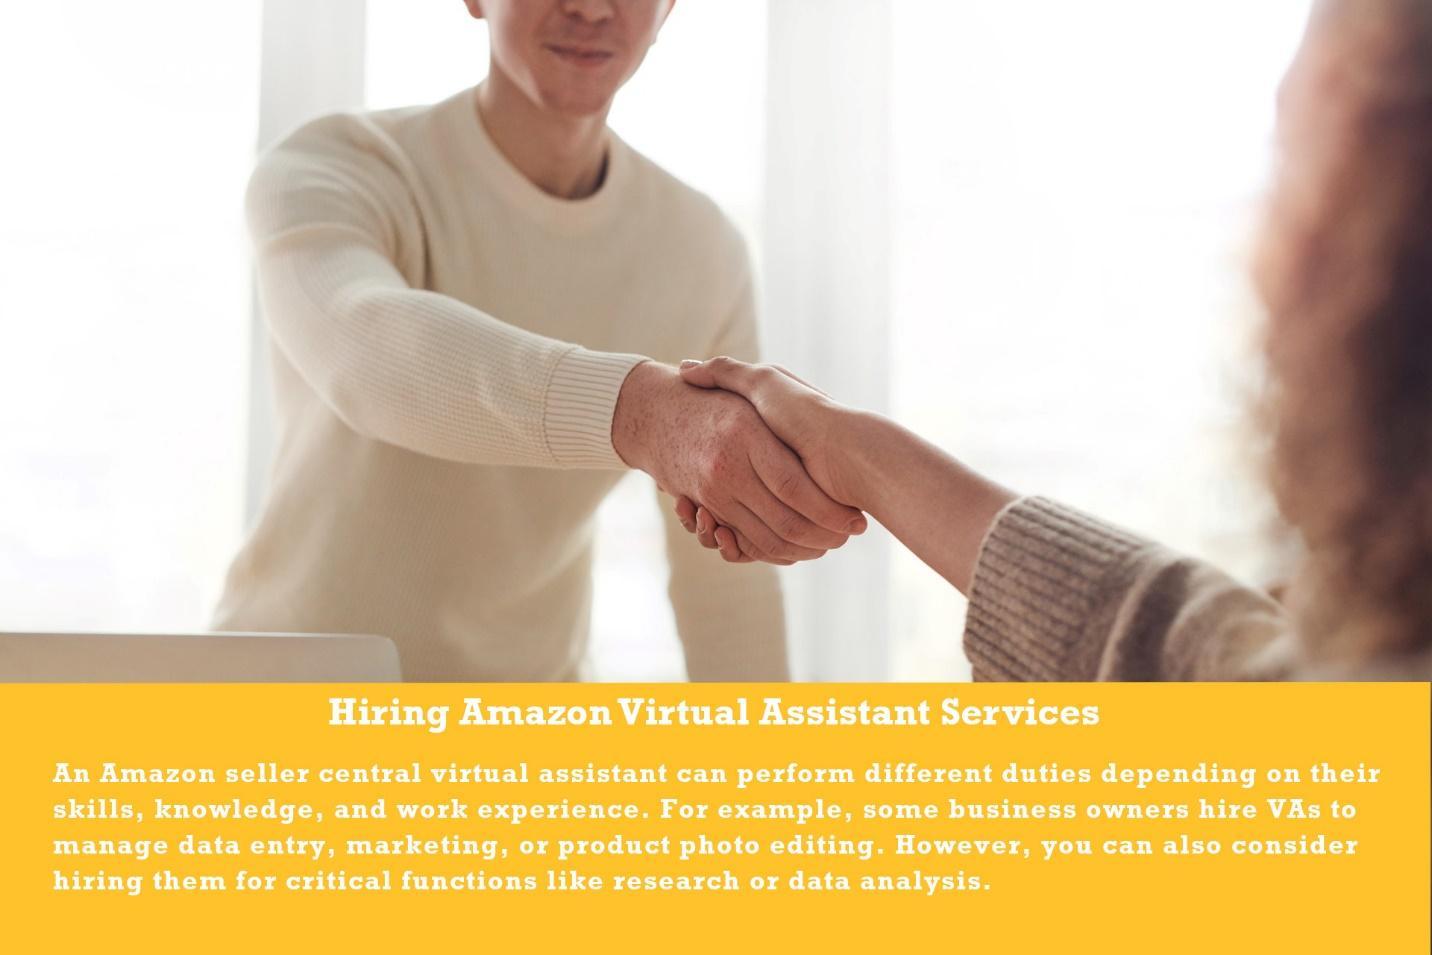 D:\AmazinEcommerce New Folder\dailytechquest.com images\2. Recruiting amazon virtual assistant services.jpg